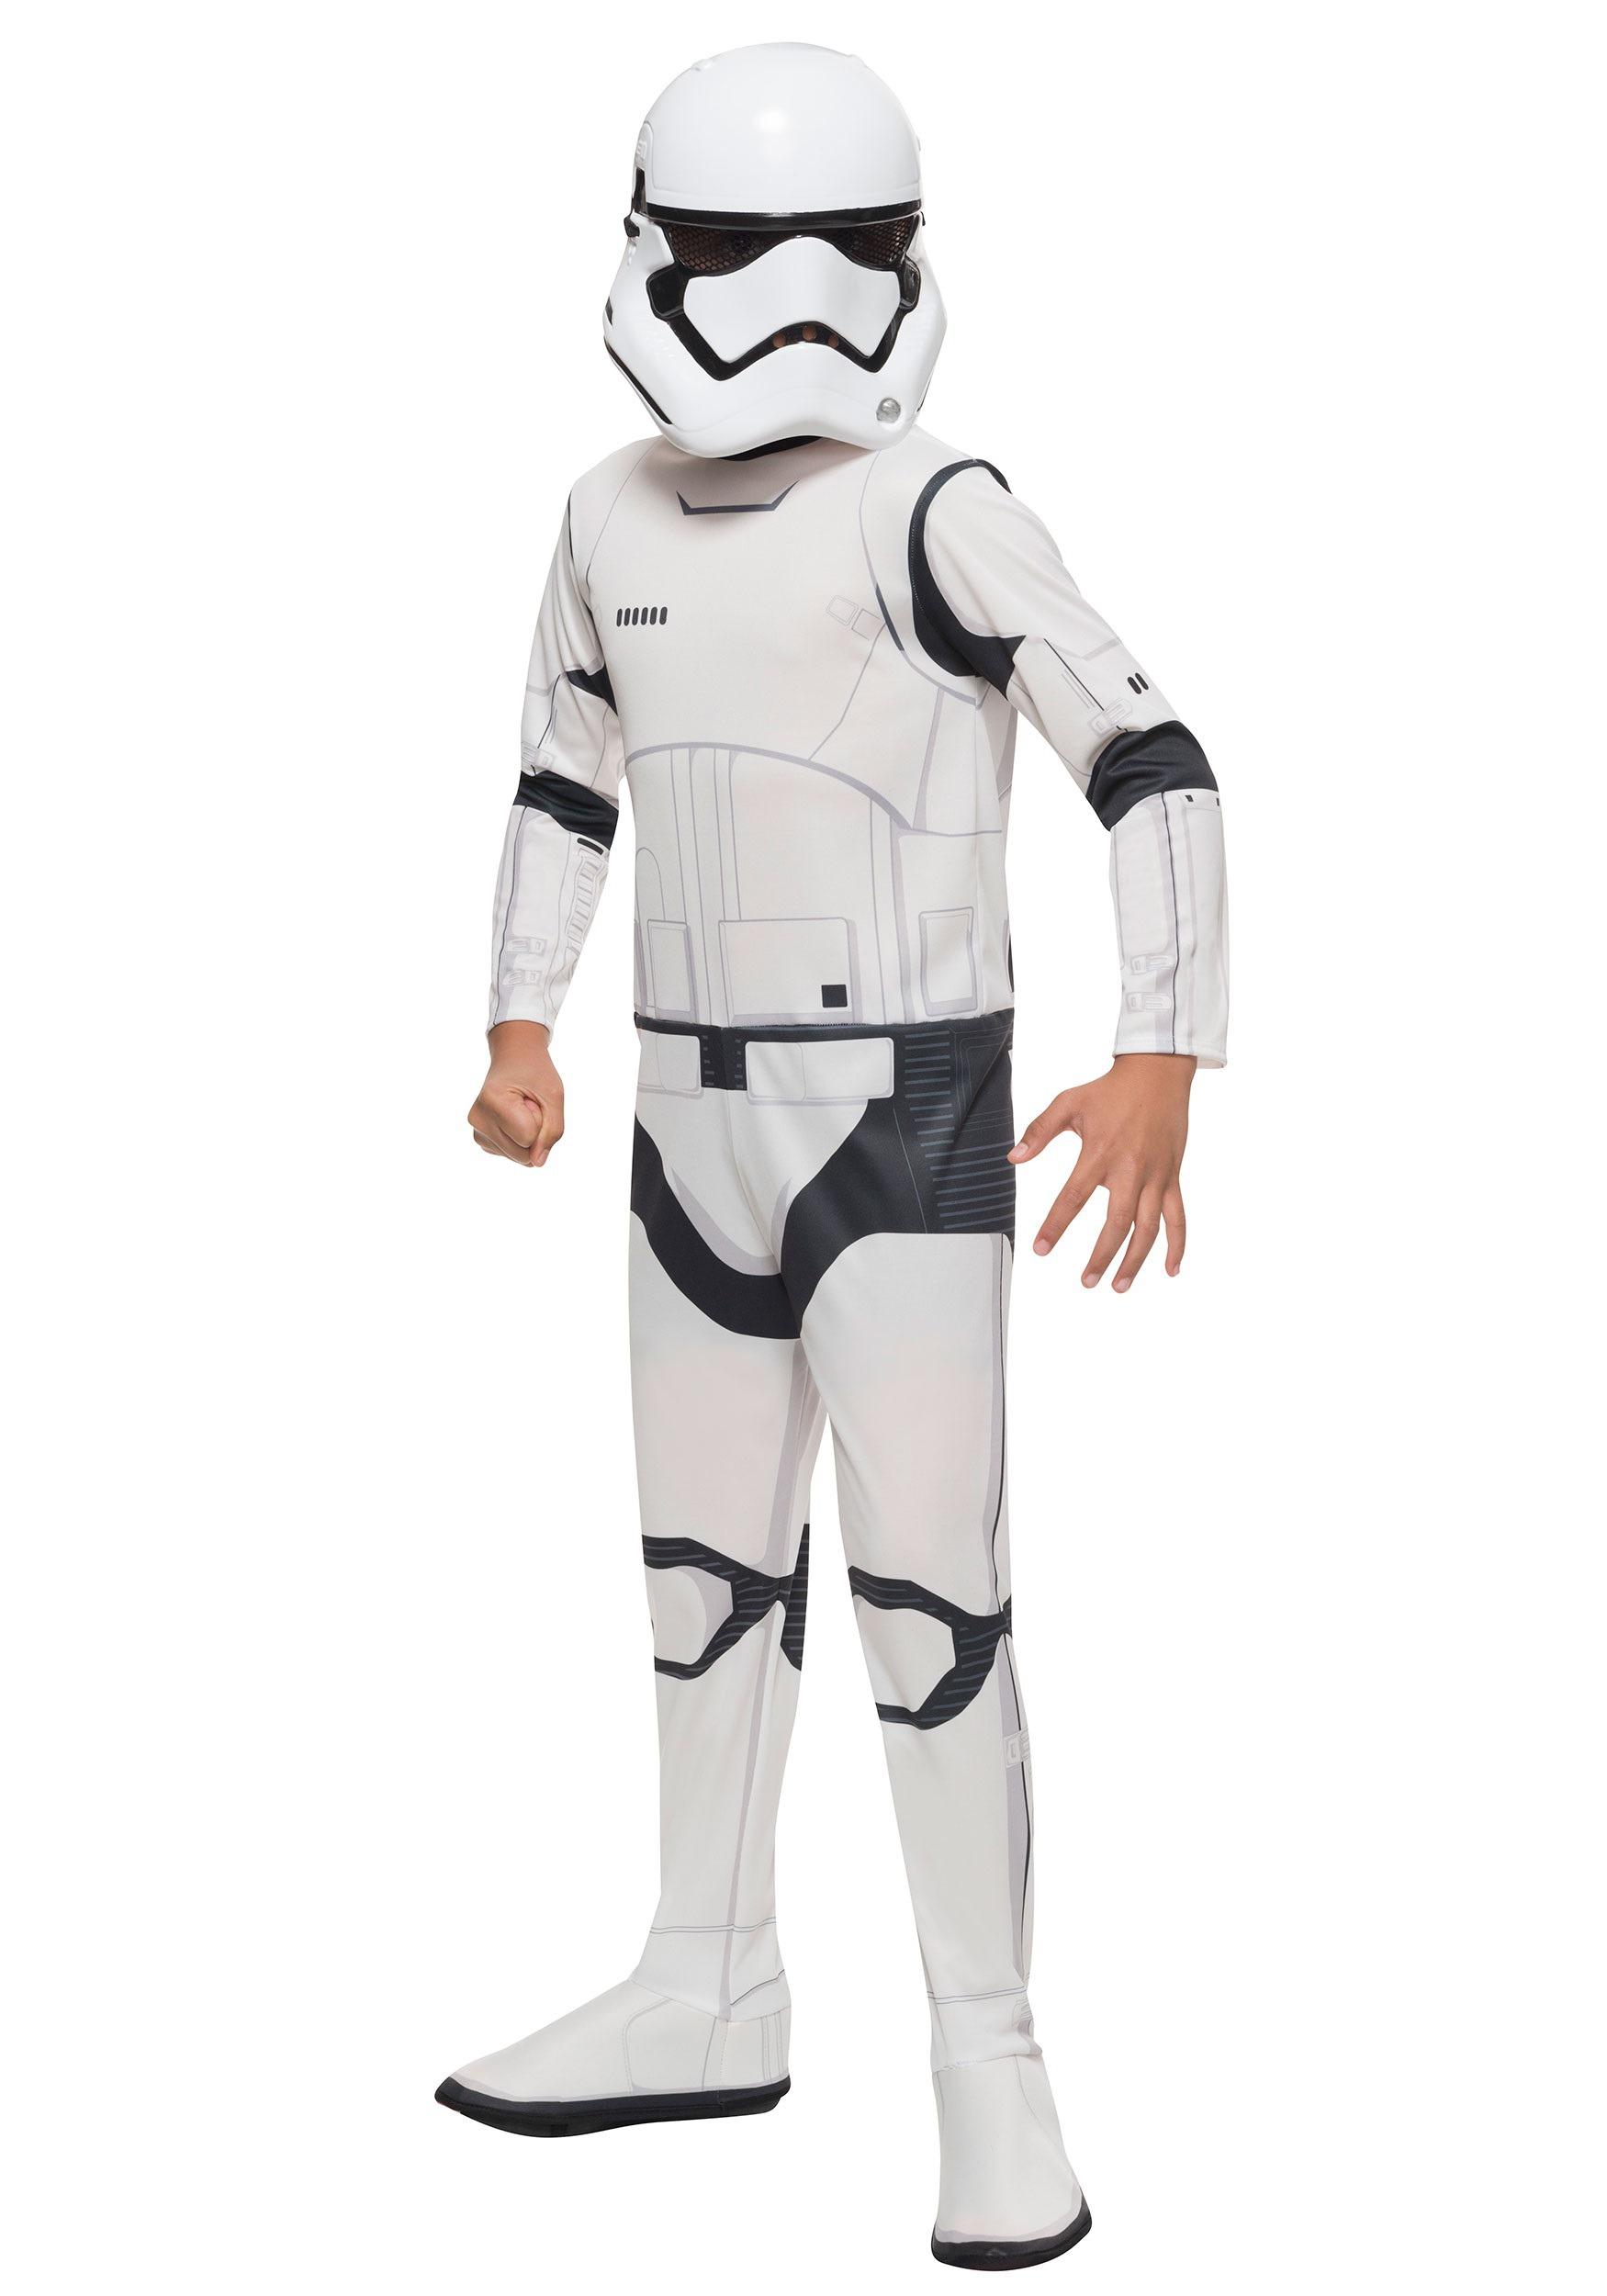 sc 1 st  Halloween Costumes & Child Classic Star Wars Ep. 7 Stormtrooper Costume